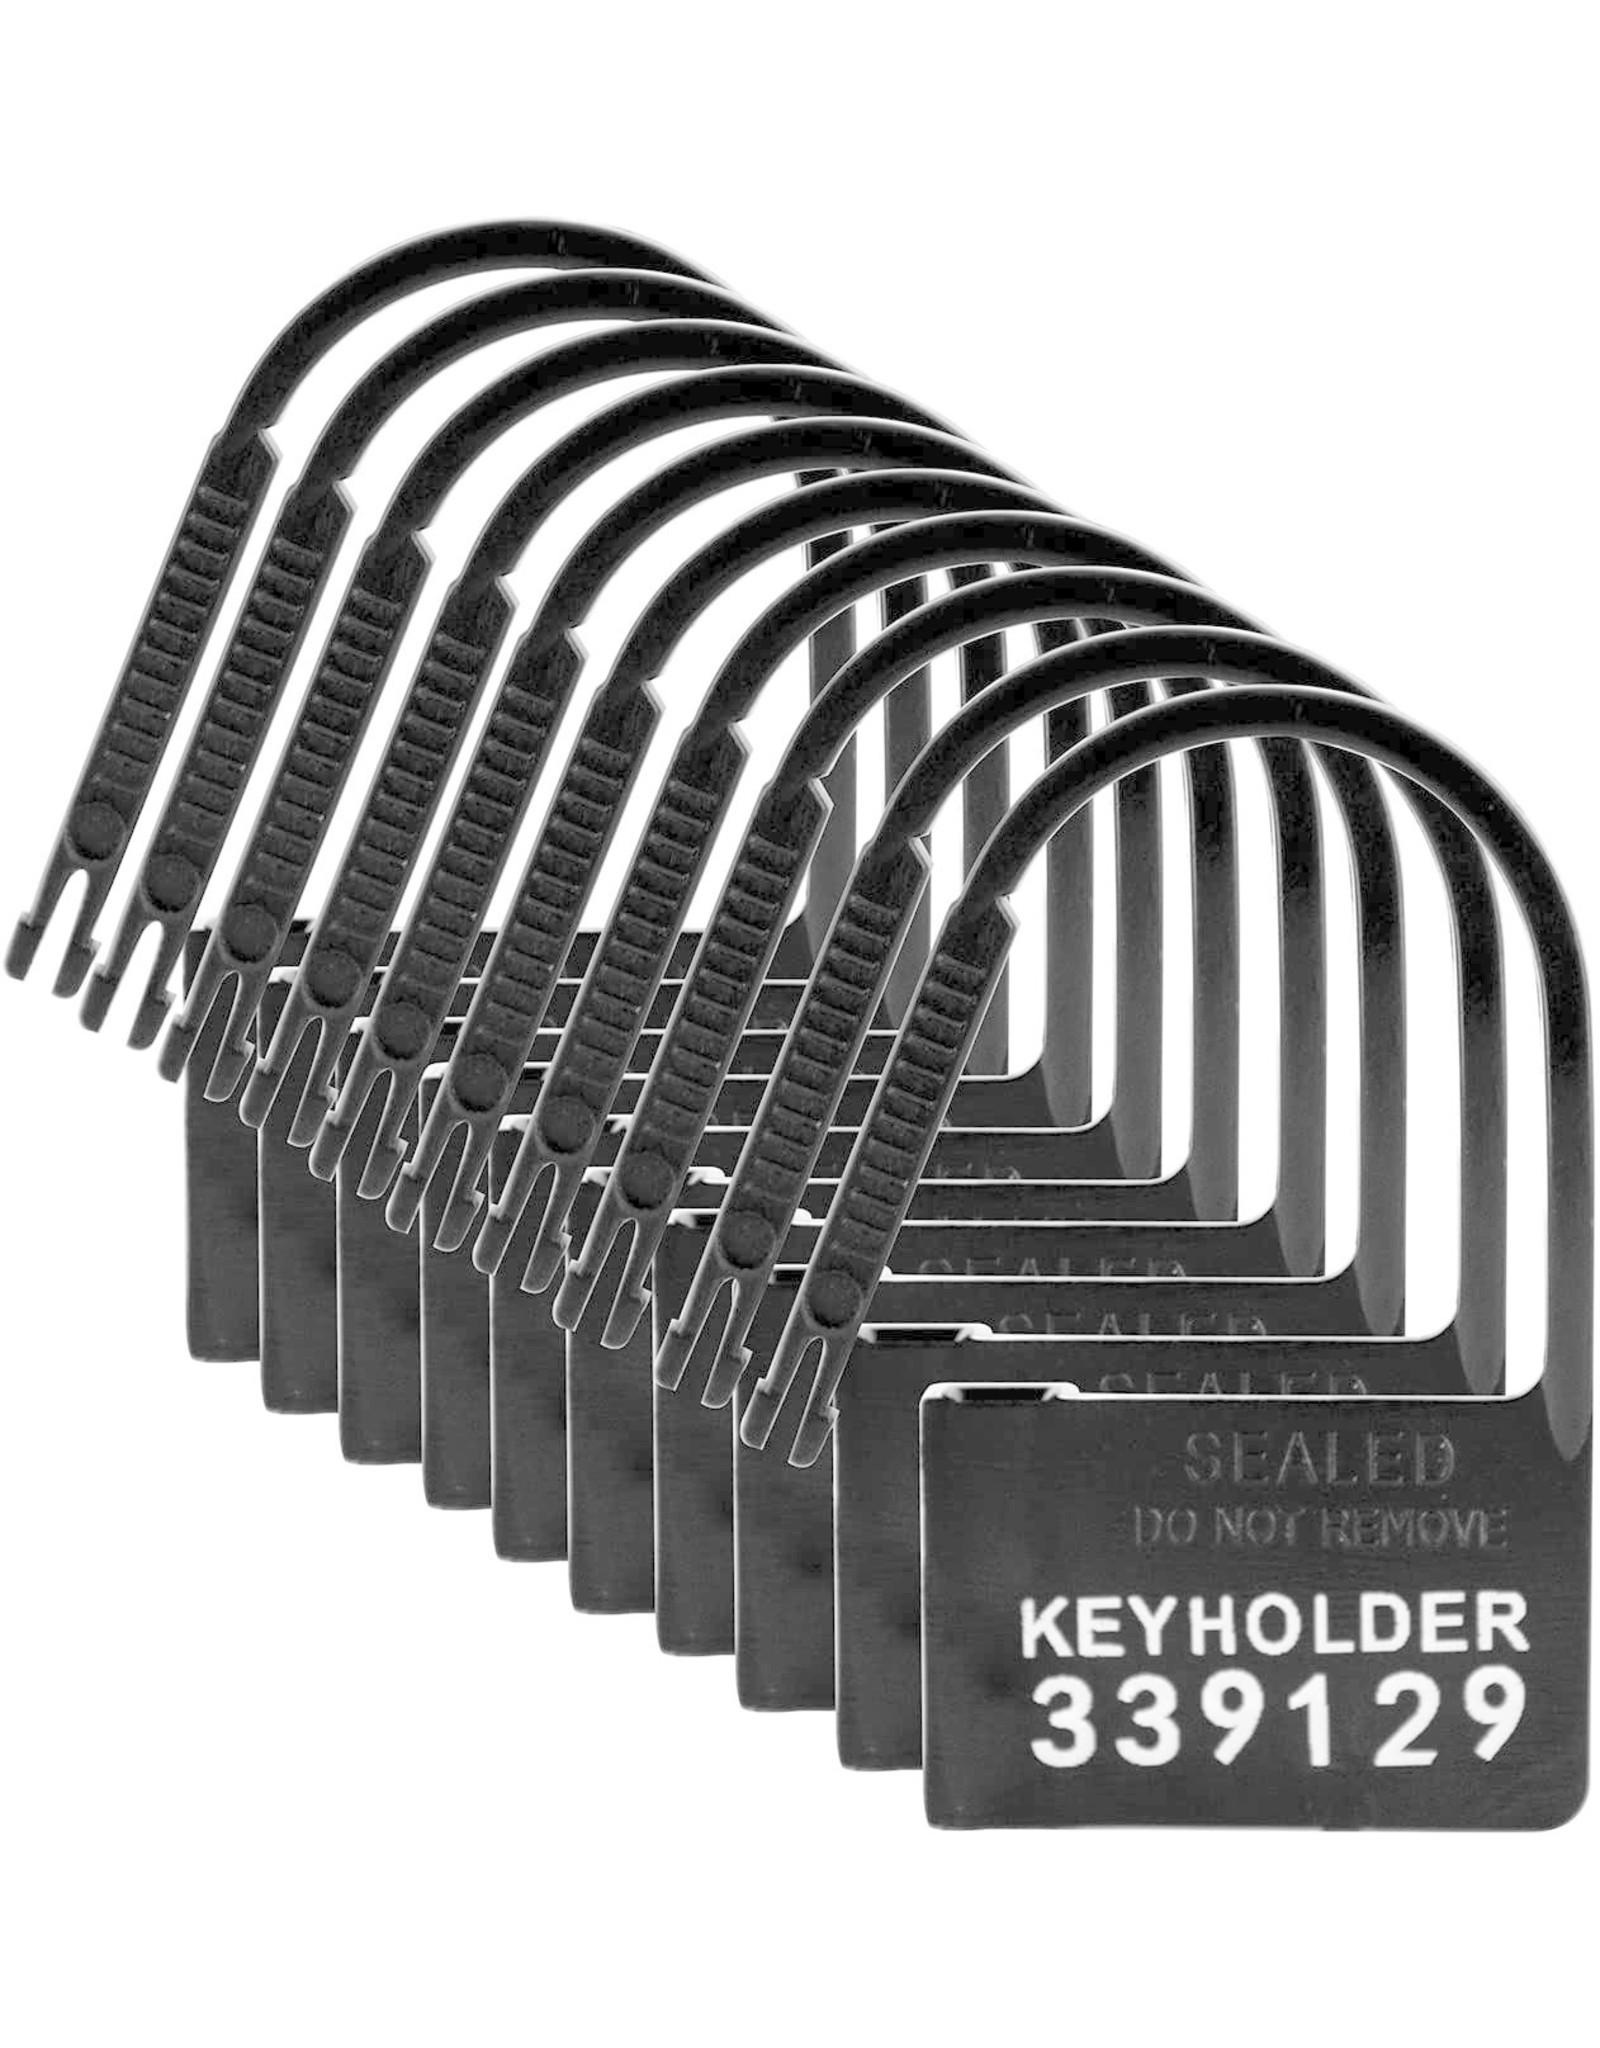 Master Series Master Series Keyholder 10 Pack